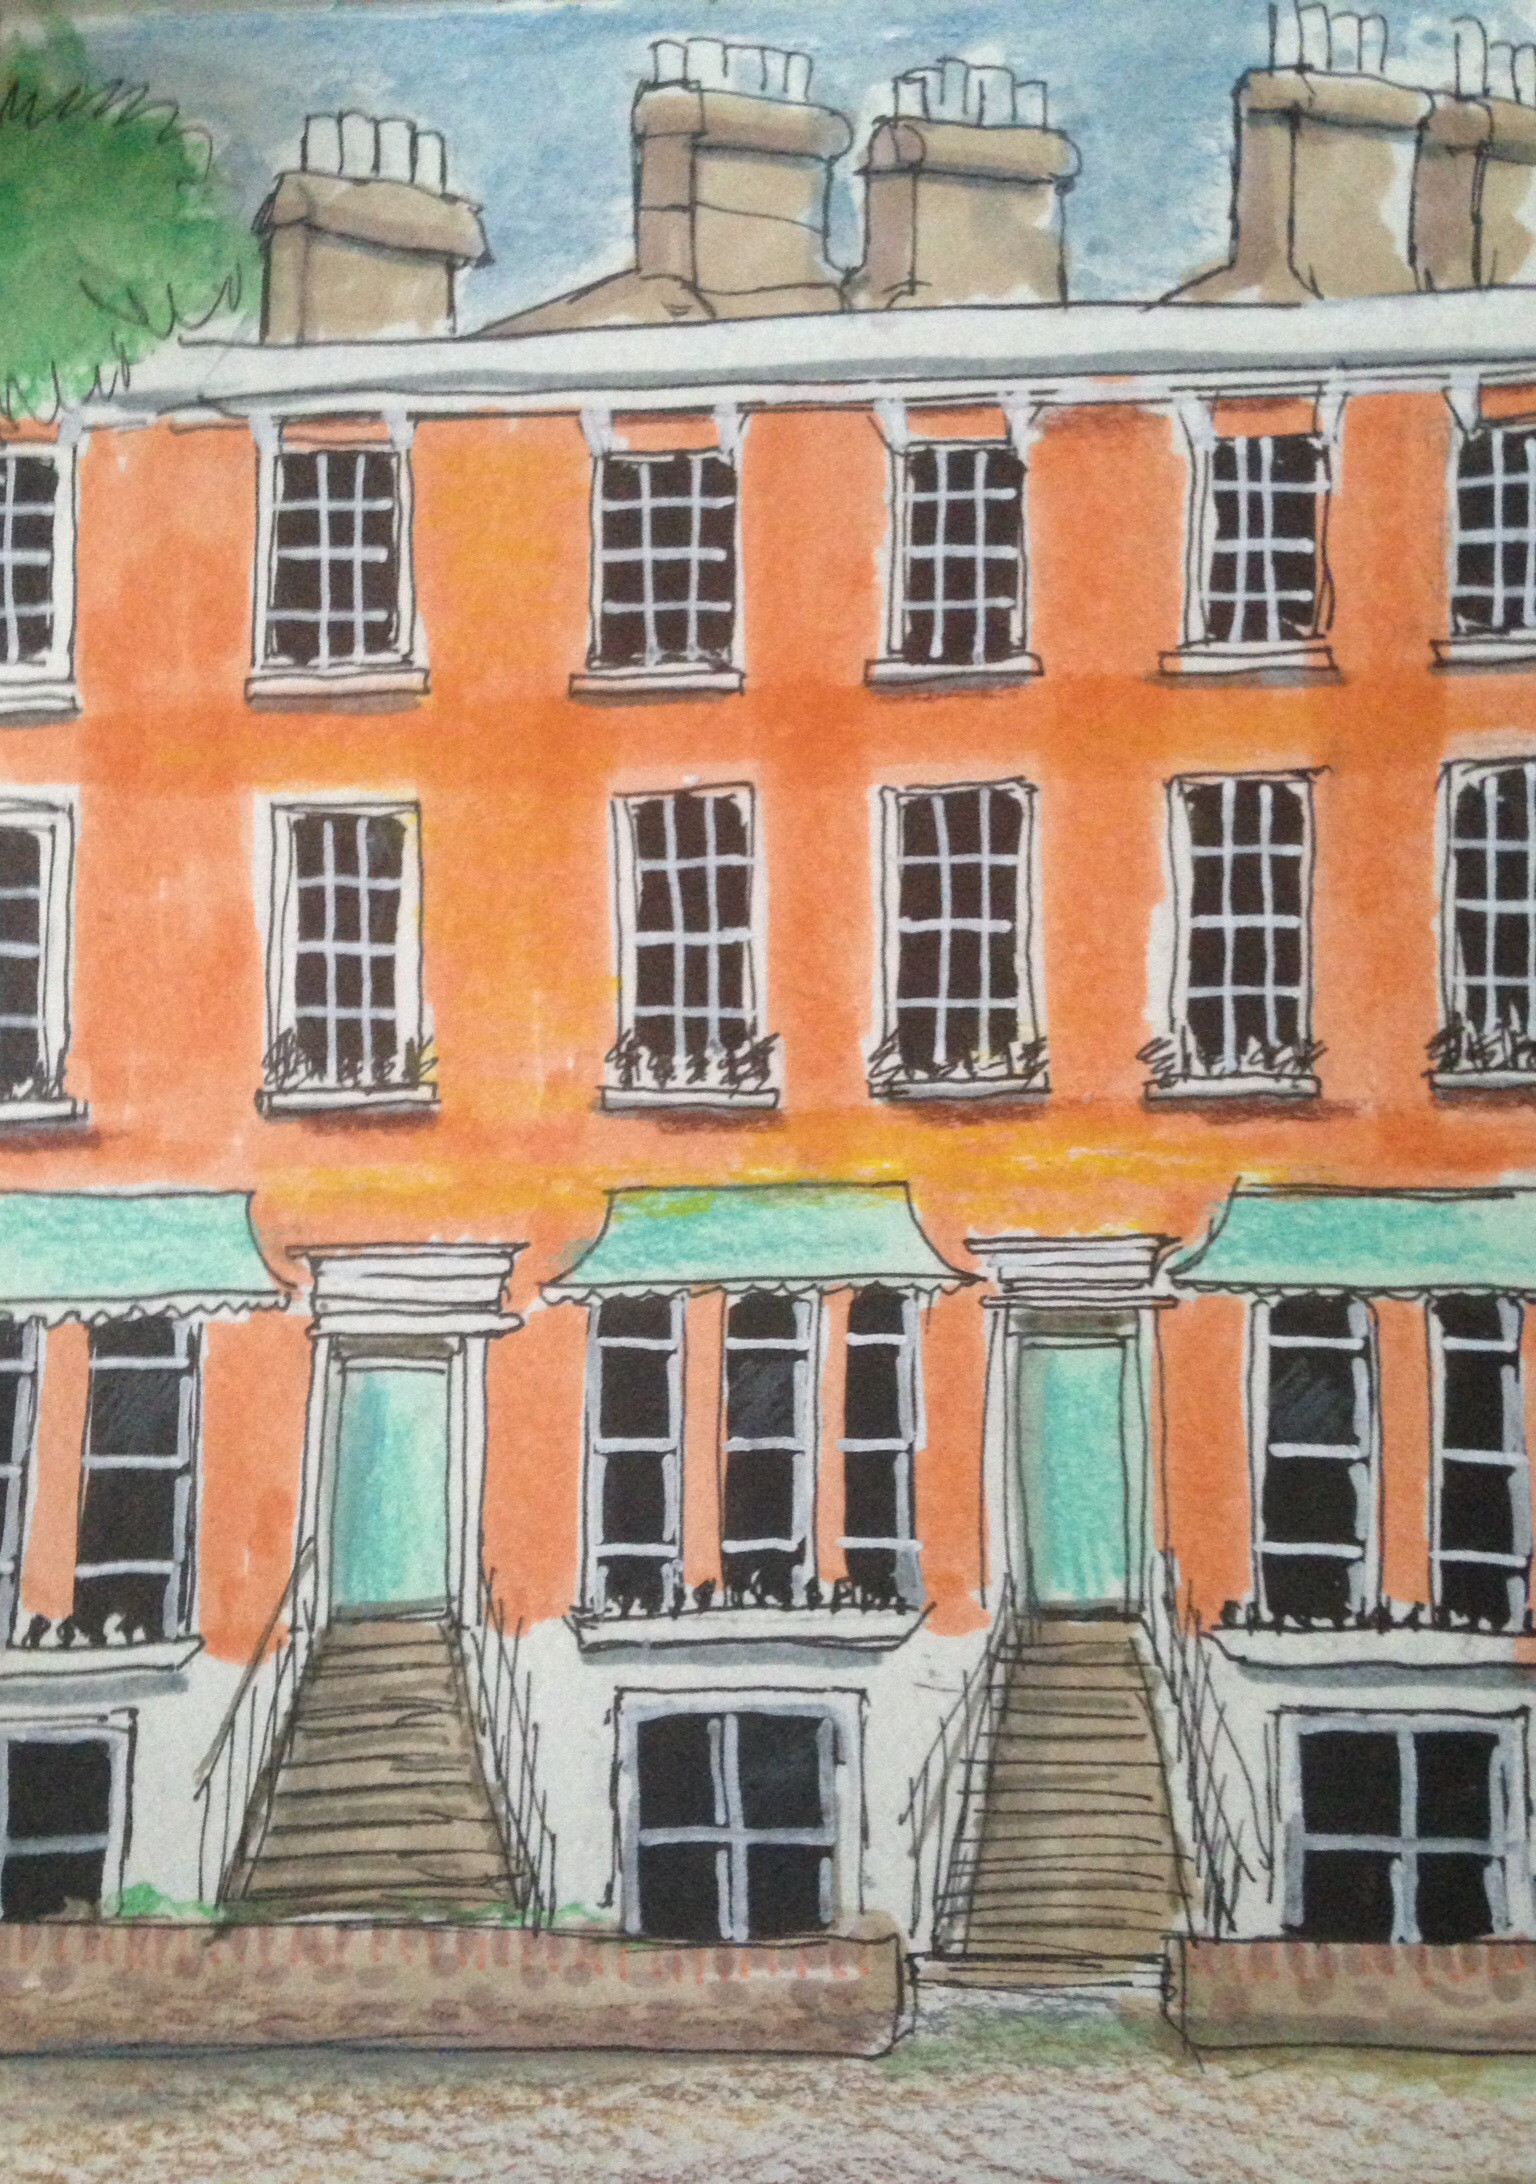 Clifton Terrace Peckham